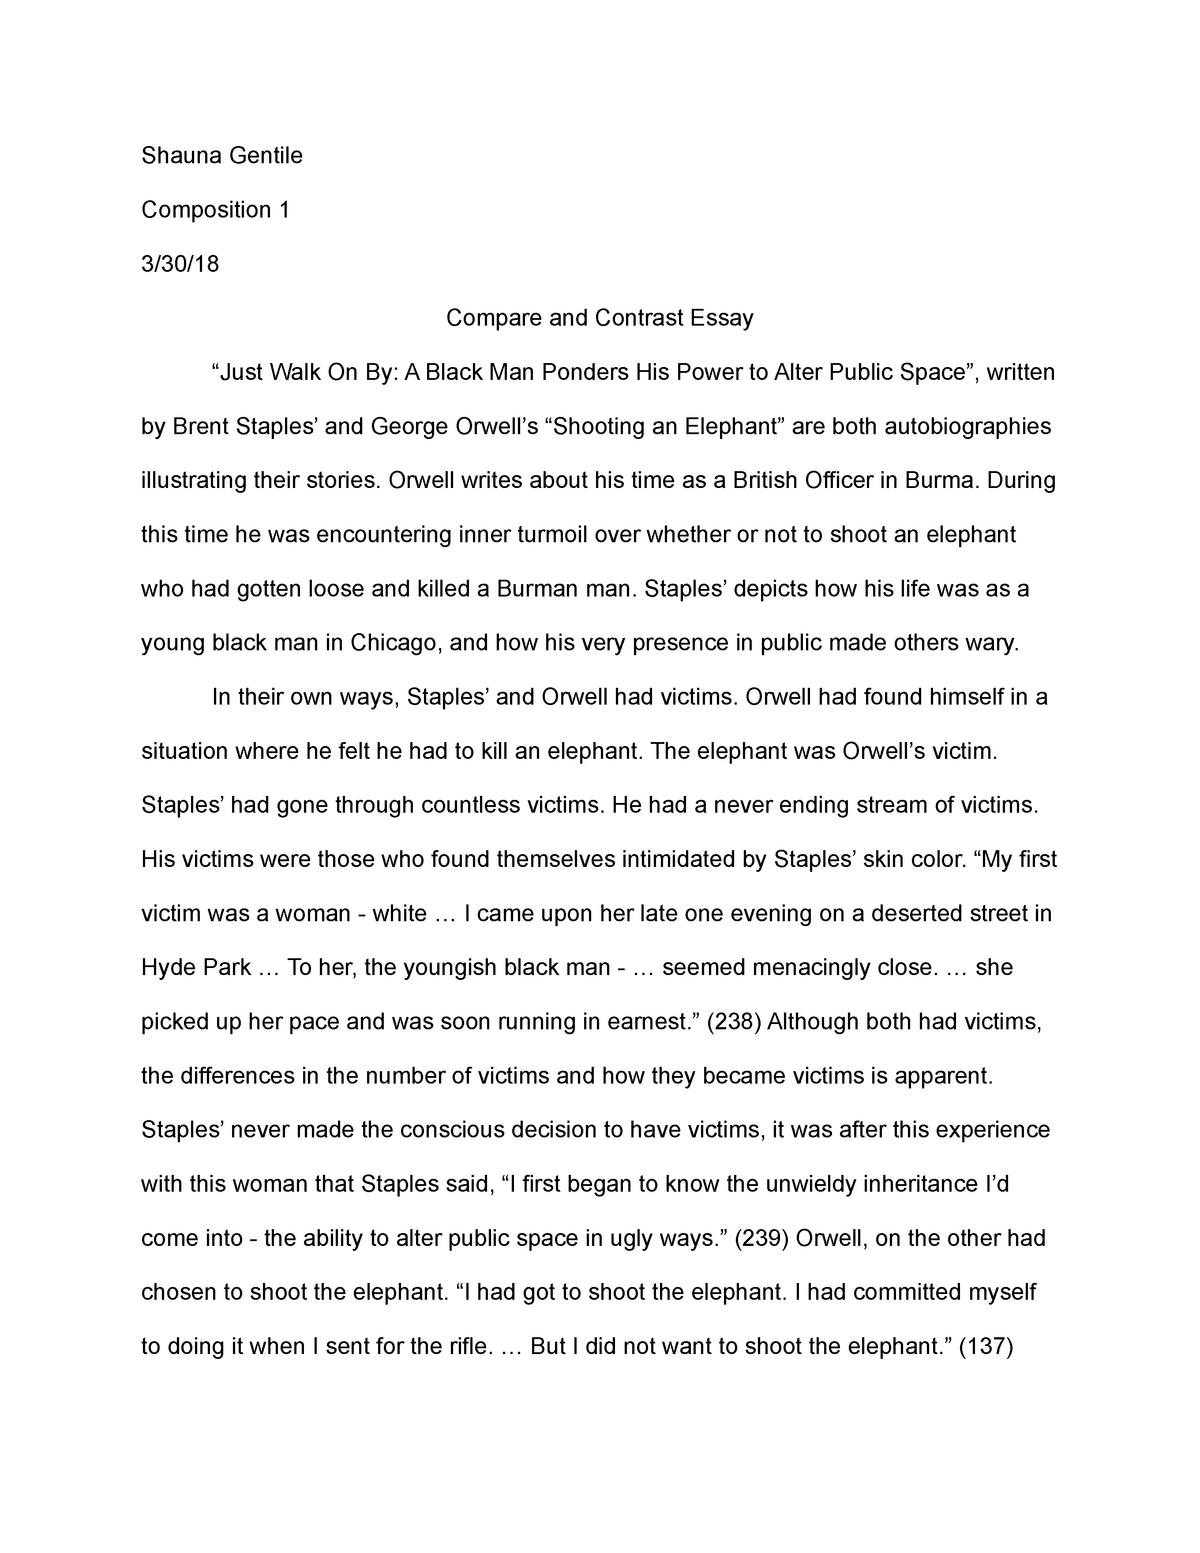 compare and contrast essay   engl  english composition i   studocu